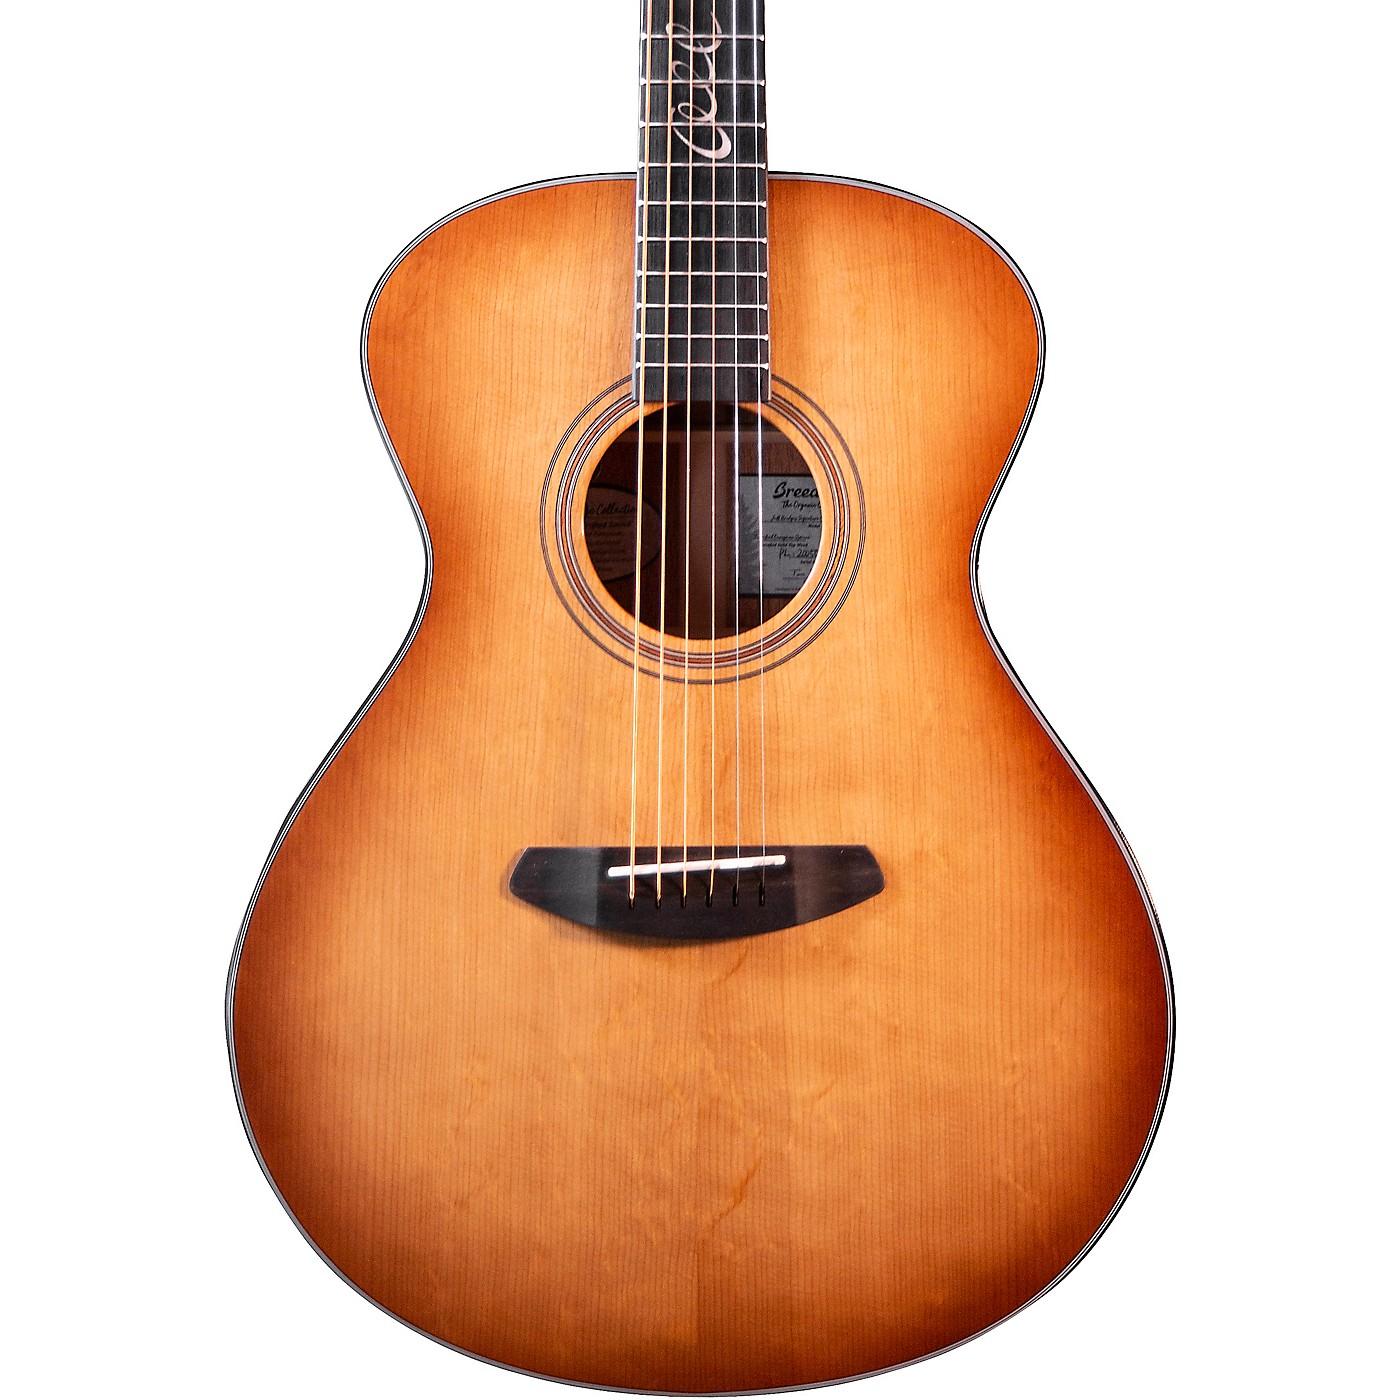 Breedlove Organic Collection Signature Concert Jeff Bridges Acoustic-Electric Guitar thumbnail